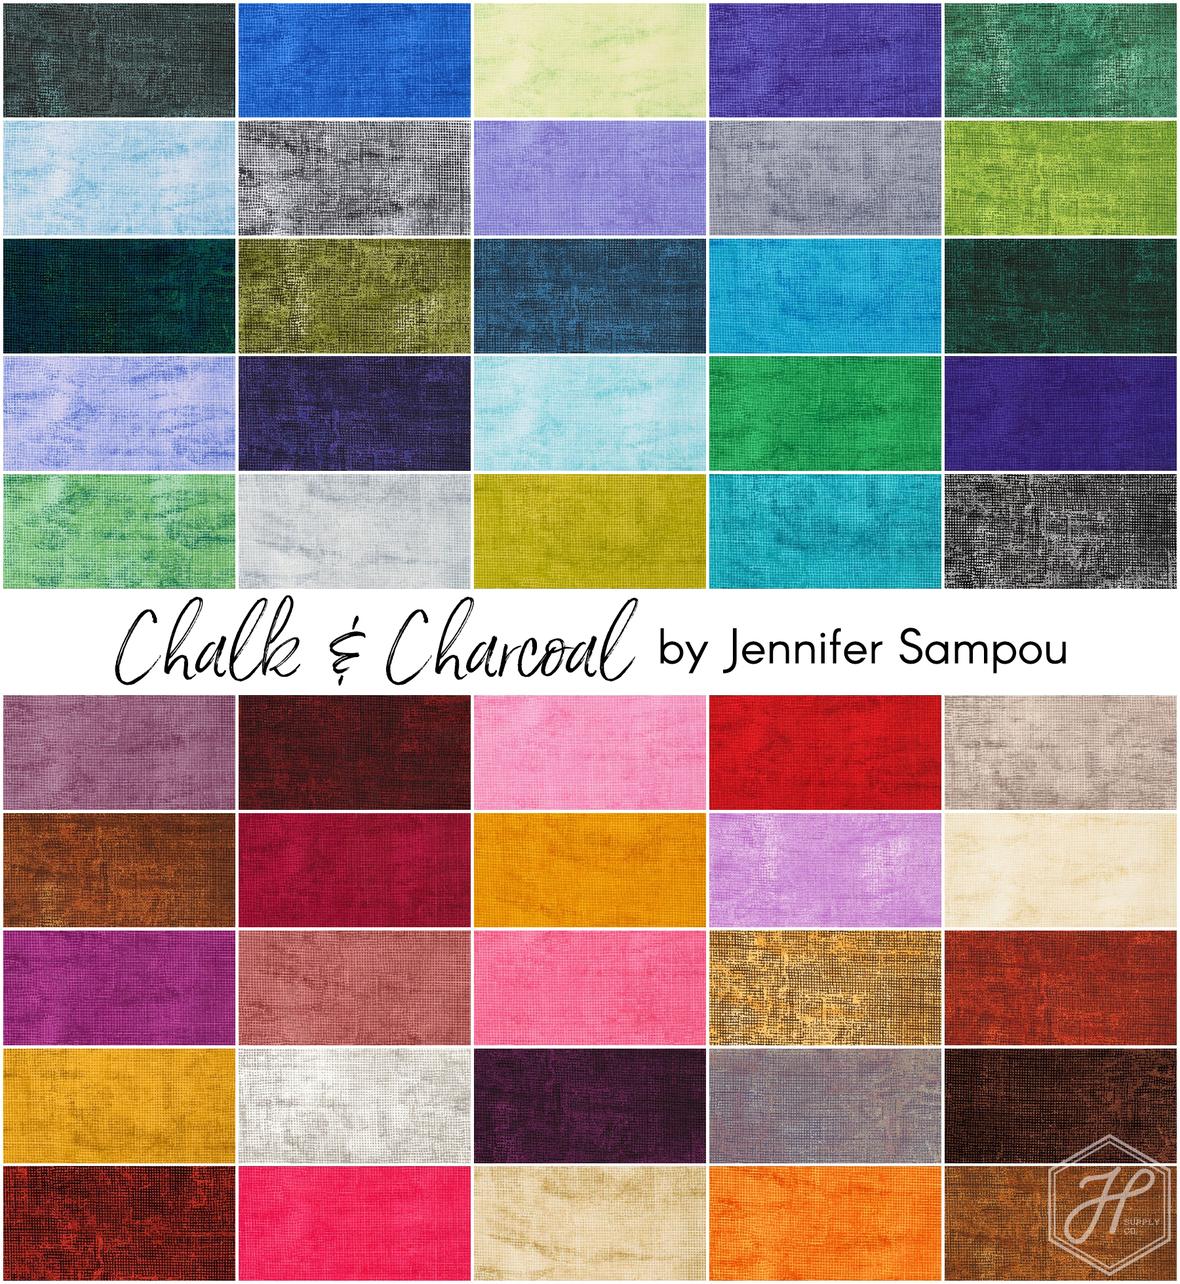 Chalk and Charcoal fabric by Jennifer Sampou at Hawthorne Supply Co.